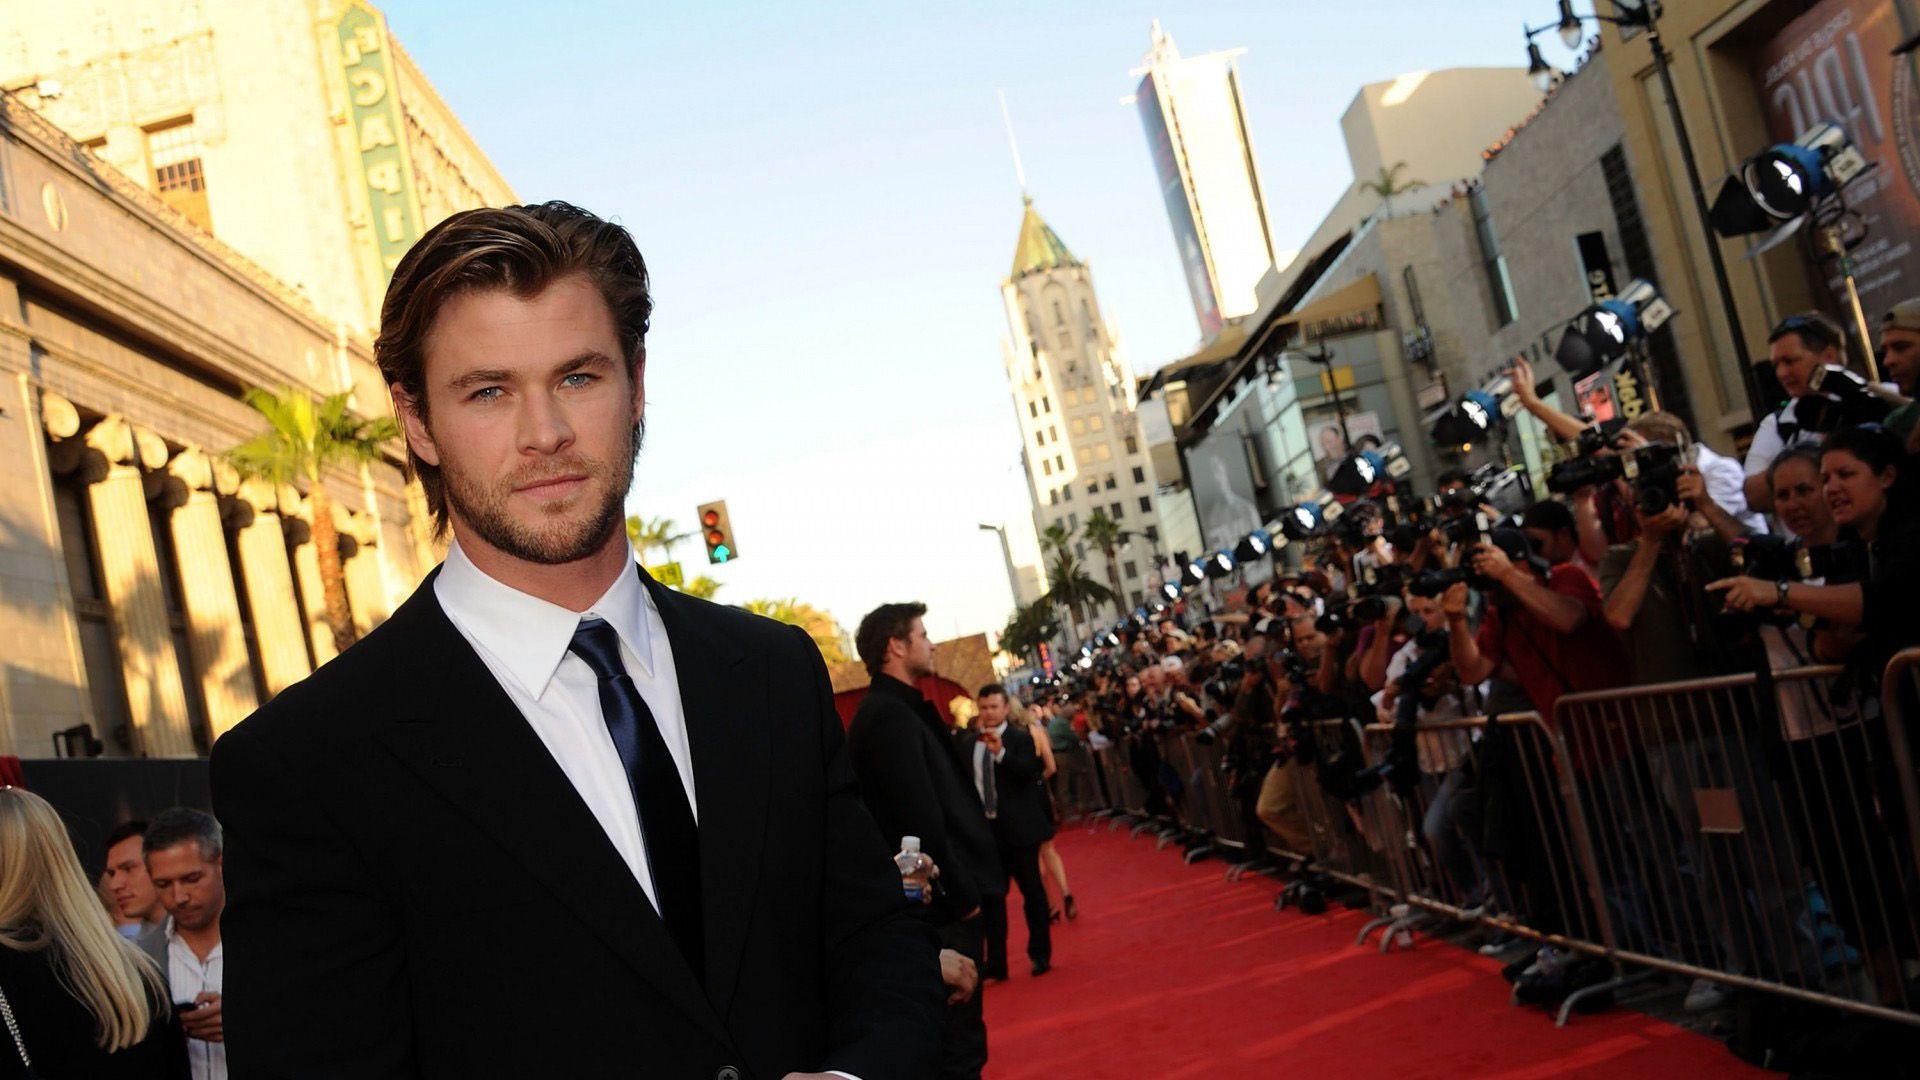 Chris Hemsworth HD Desktop Wallpapers คริส เฮ็มส์เวิร์ธ